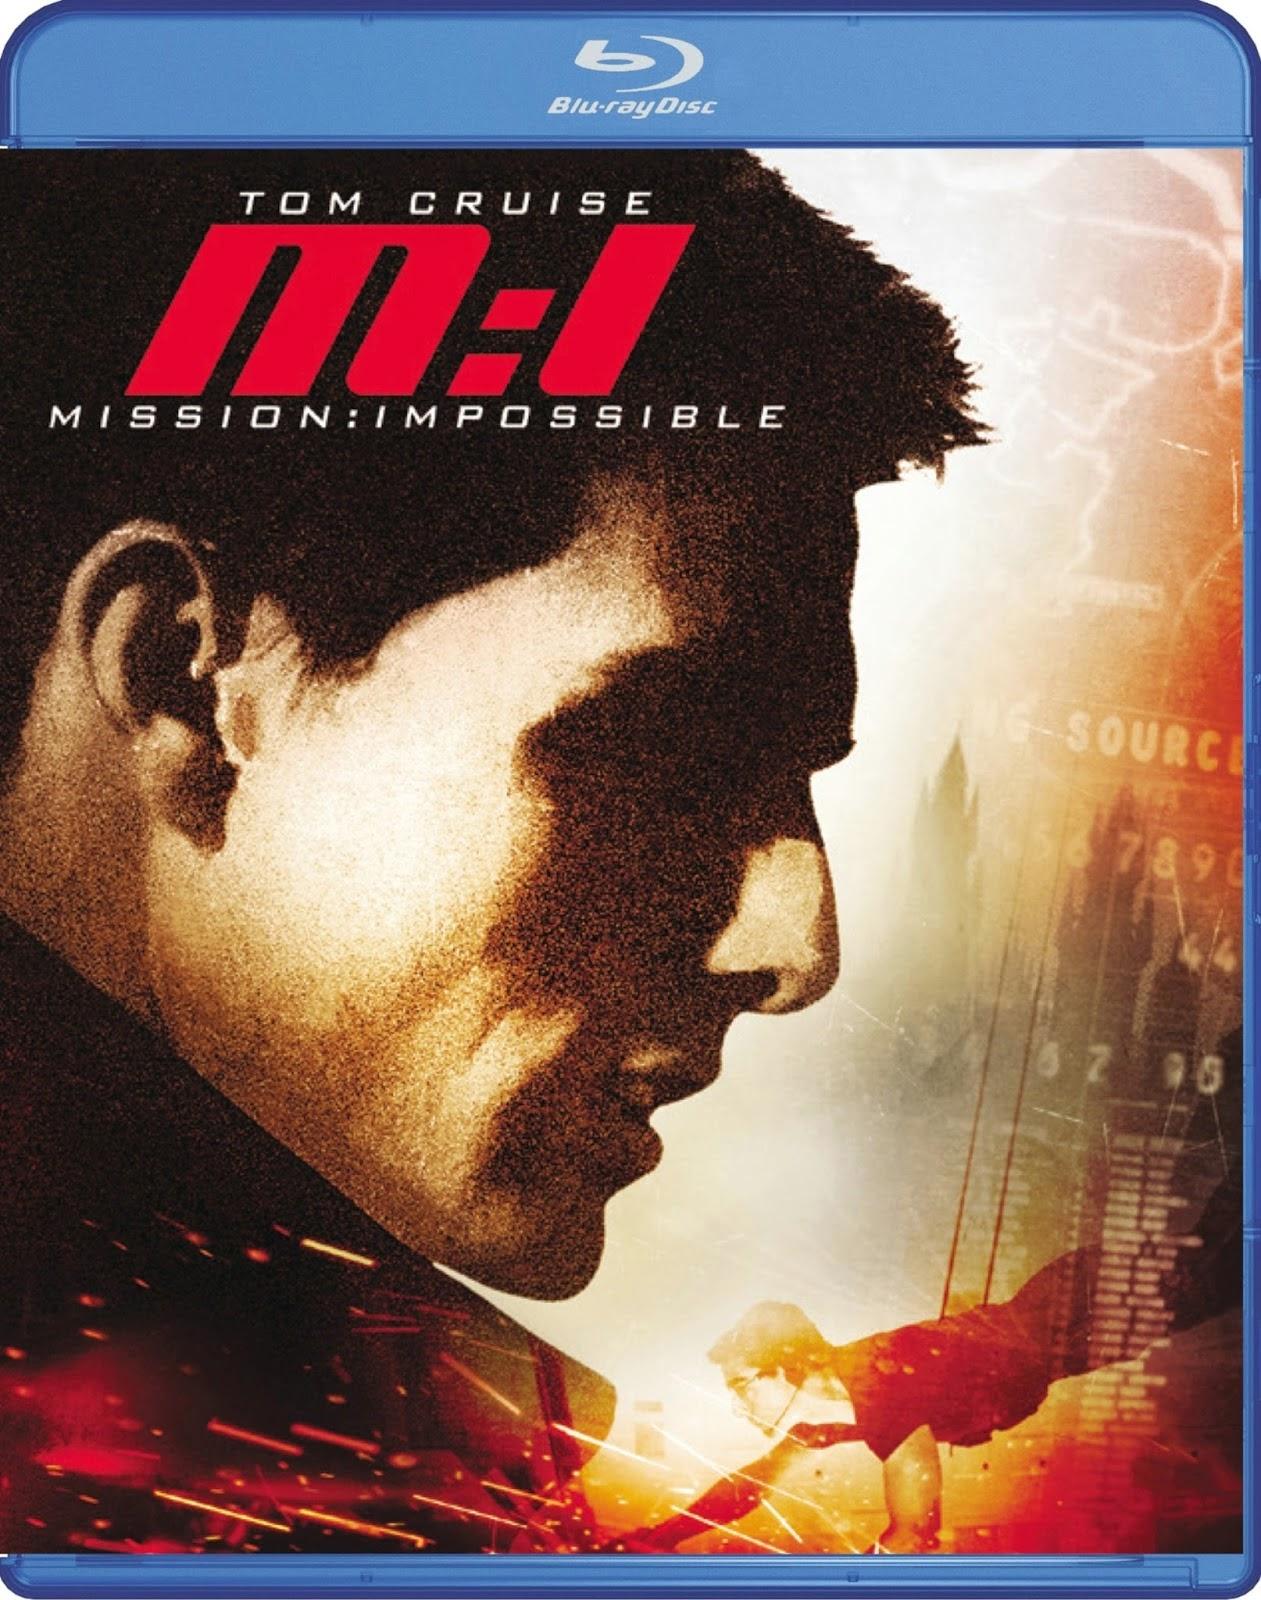 Mission: Impossible 1996 ฝ่าปฏิบัติการสะท้านโลก